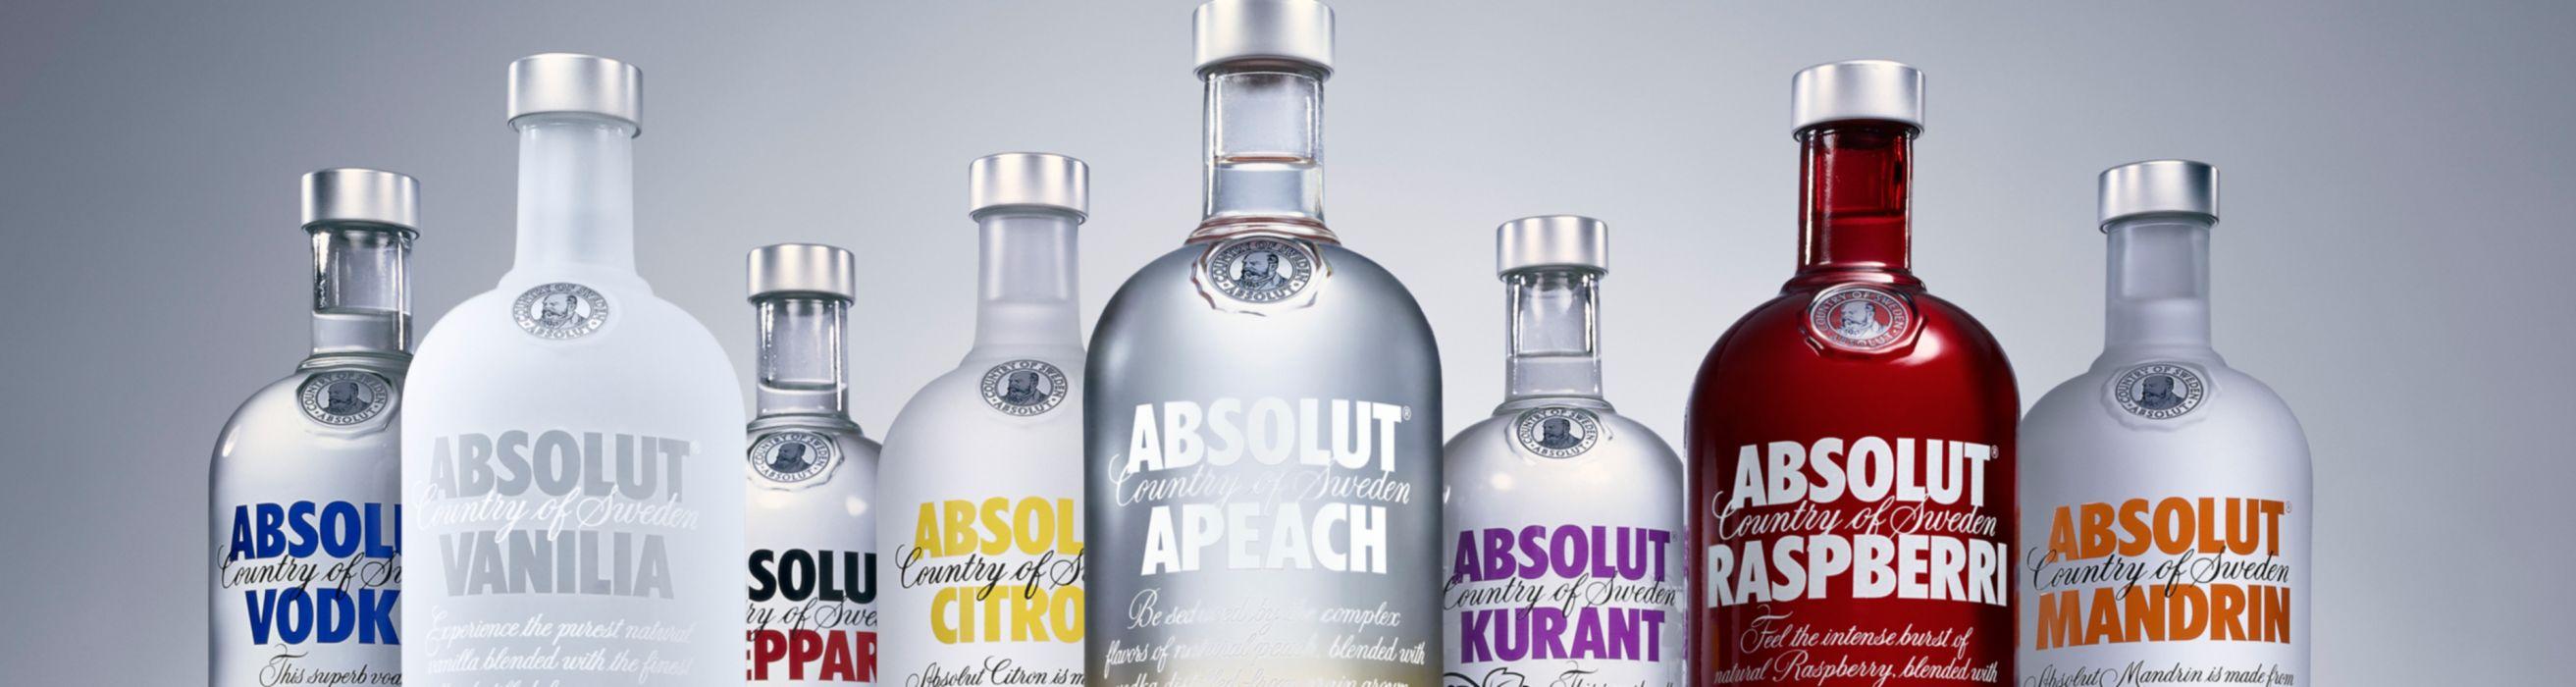 vodka Absolut wallpaper